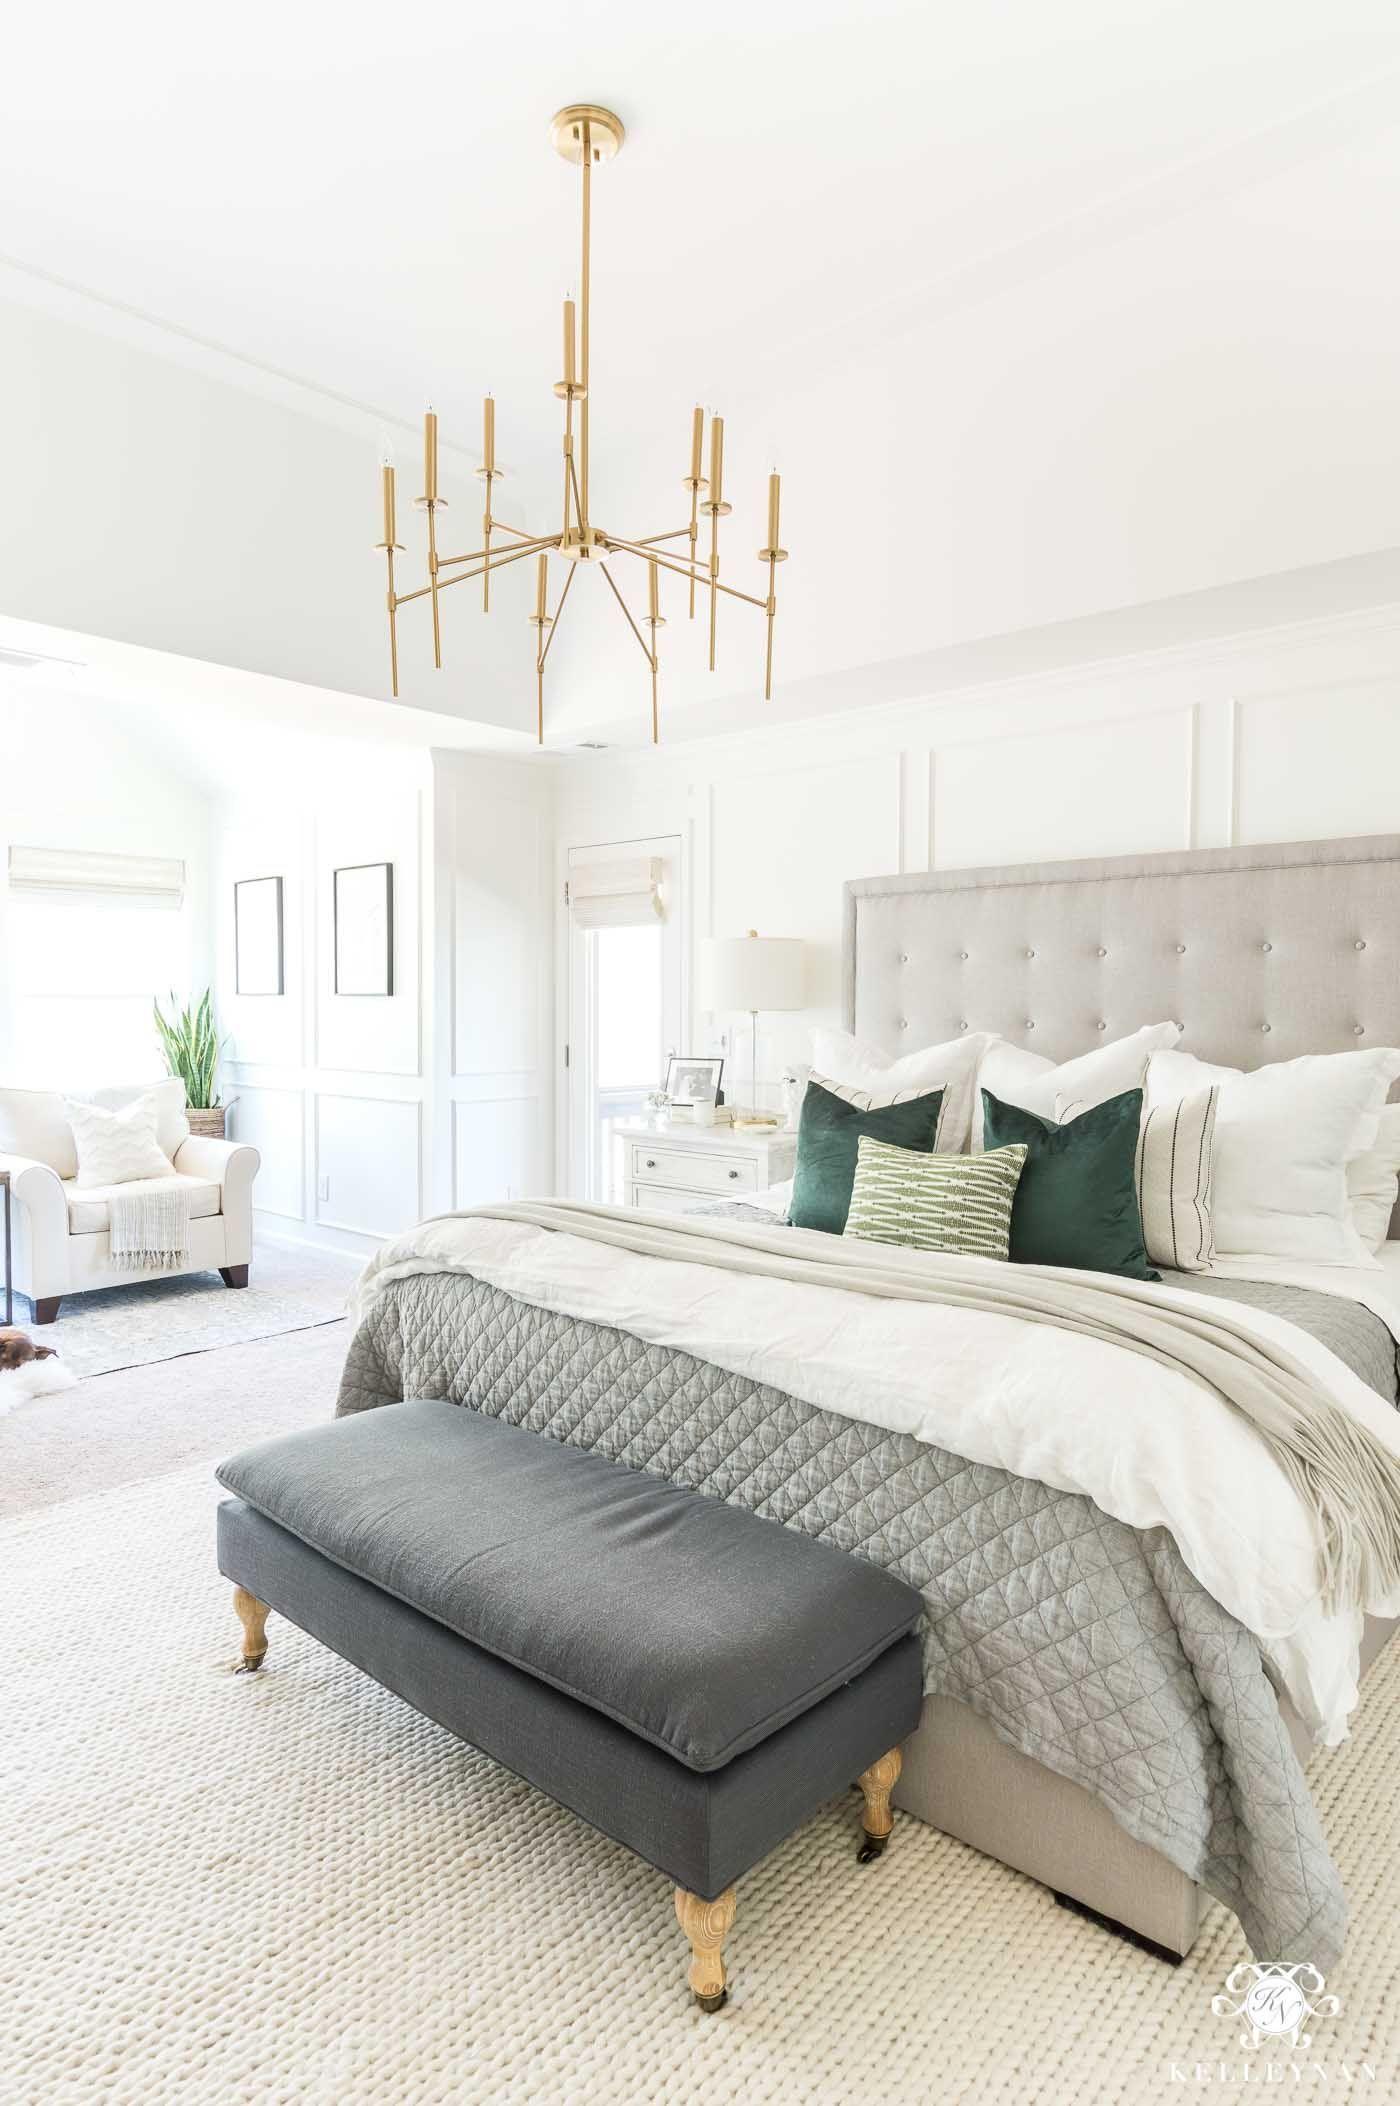 Vintage Inspired Bedrooms